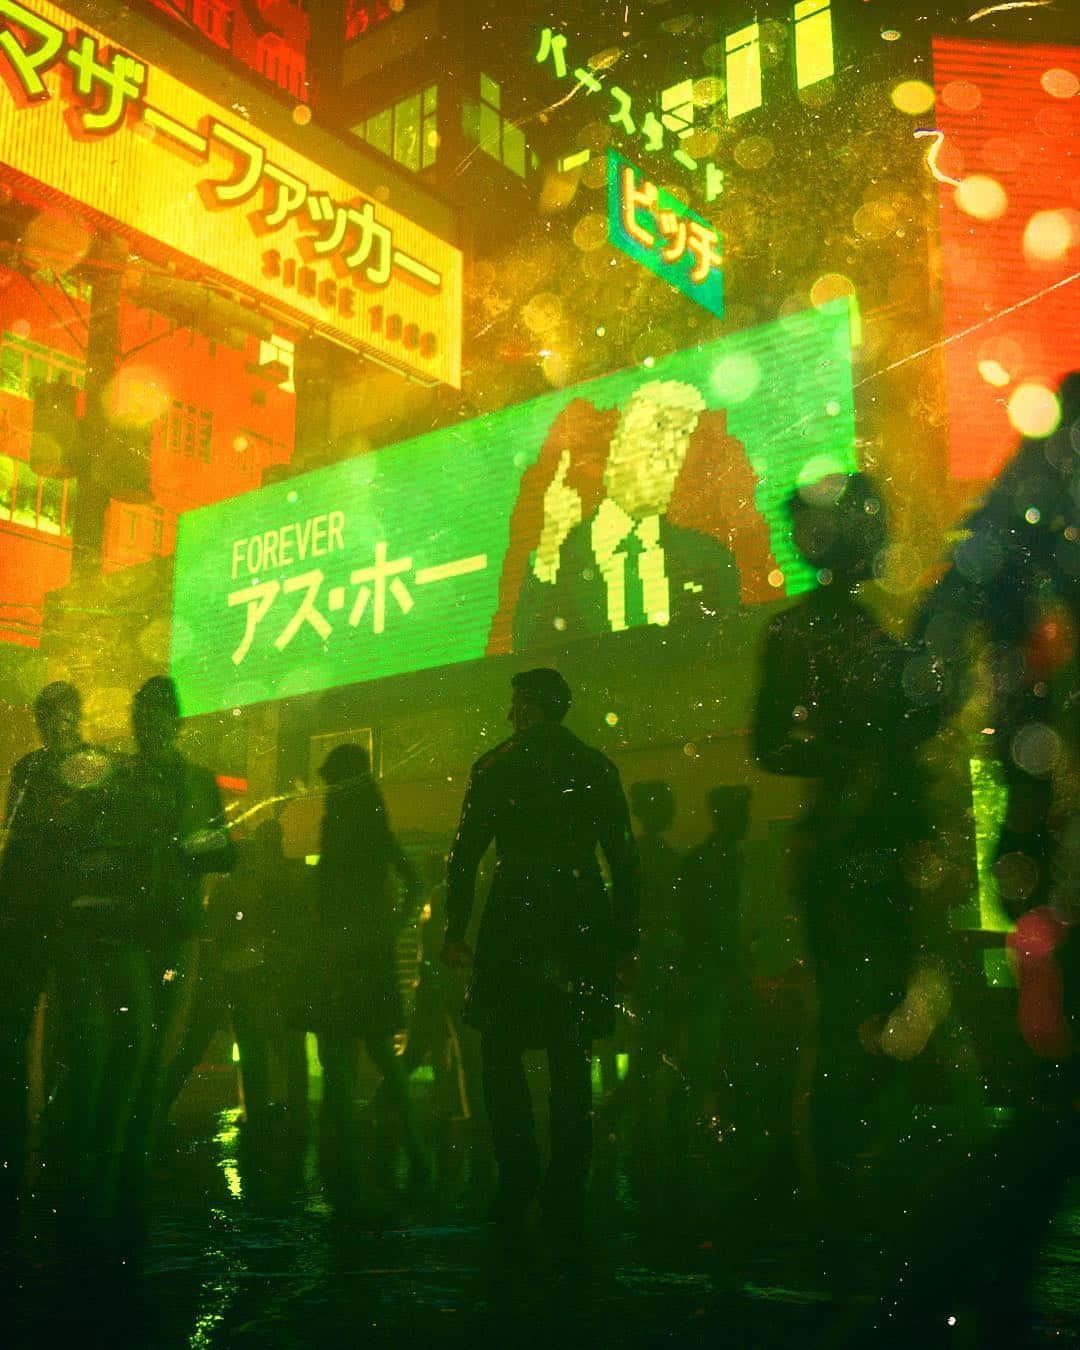 2. abel chan lights